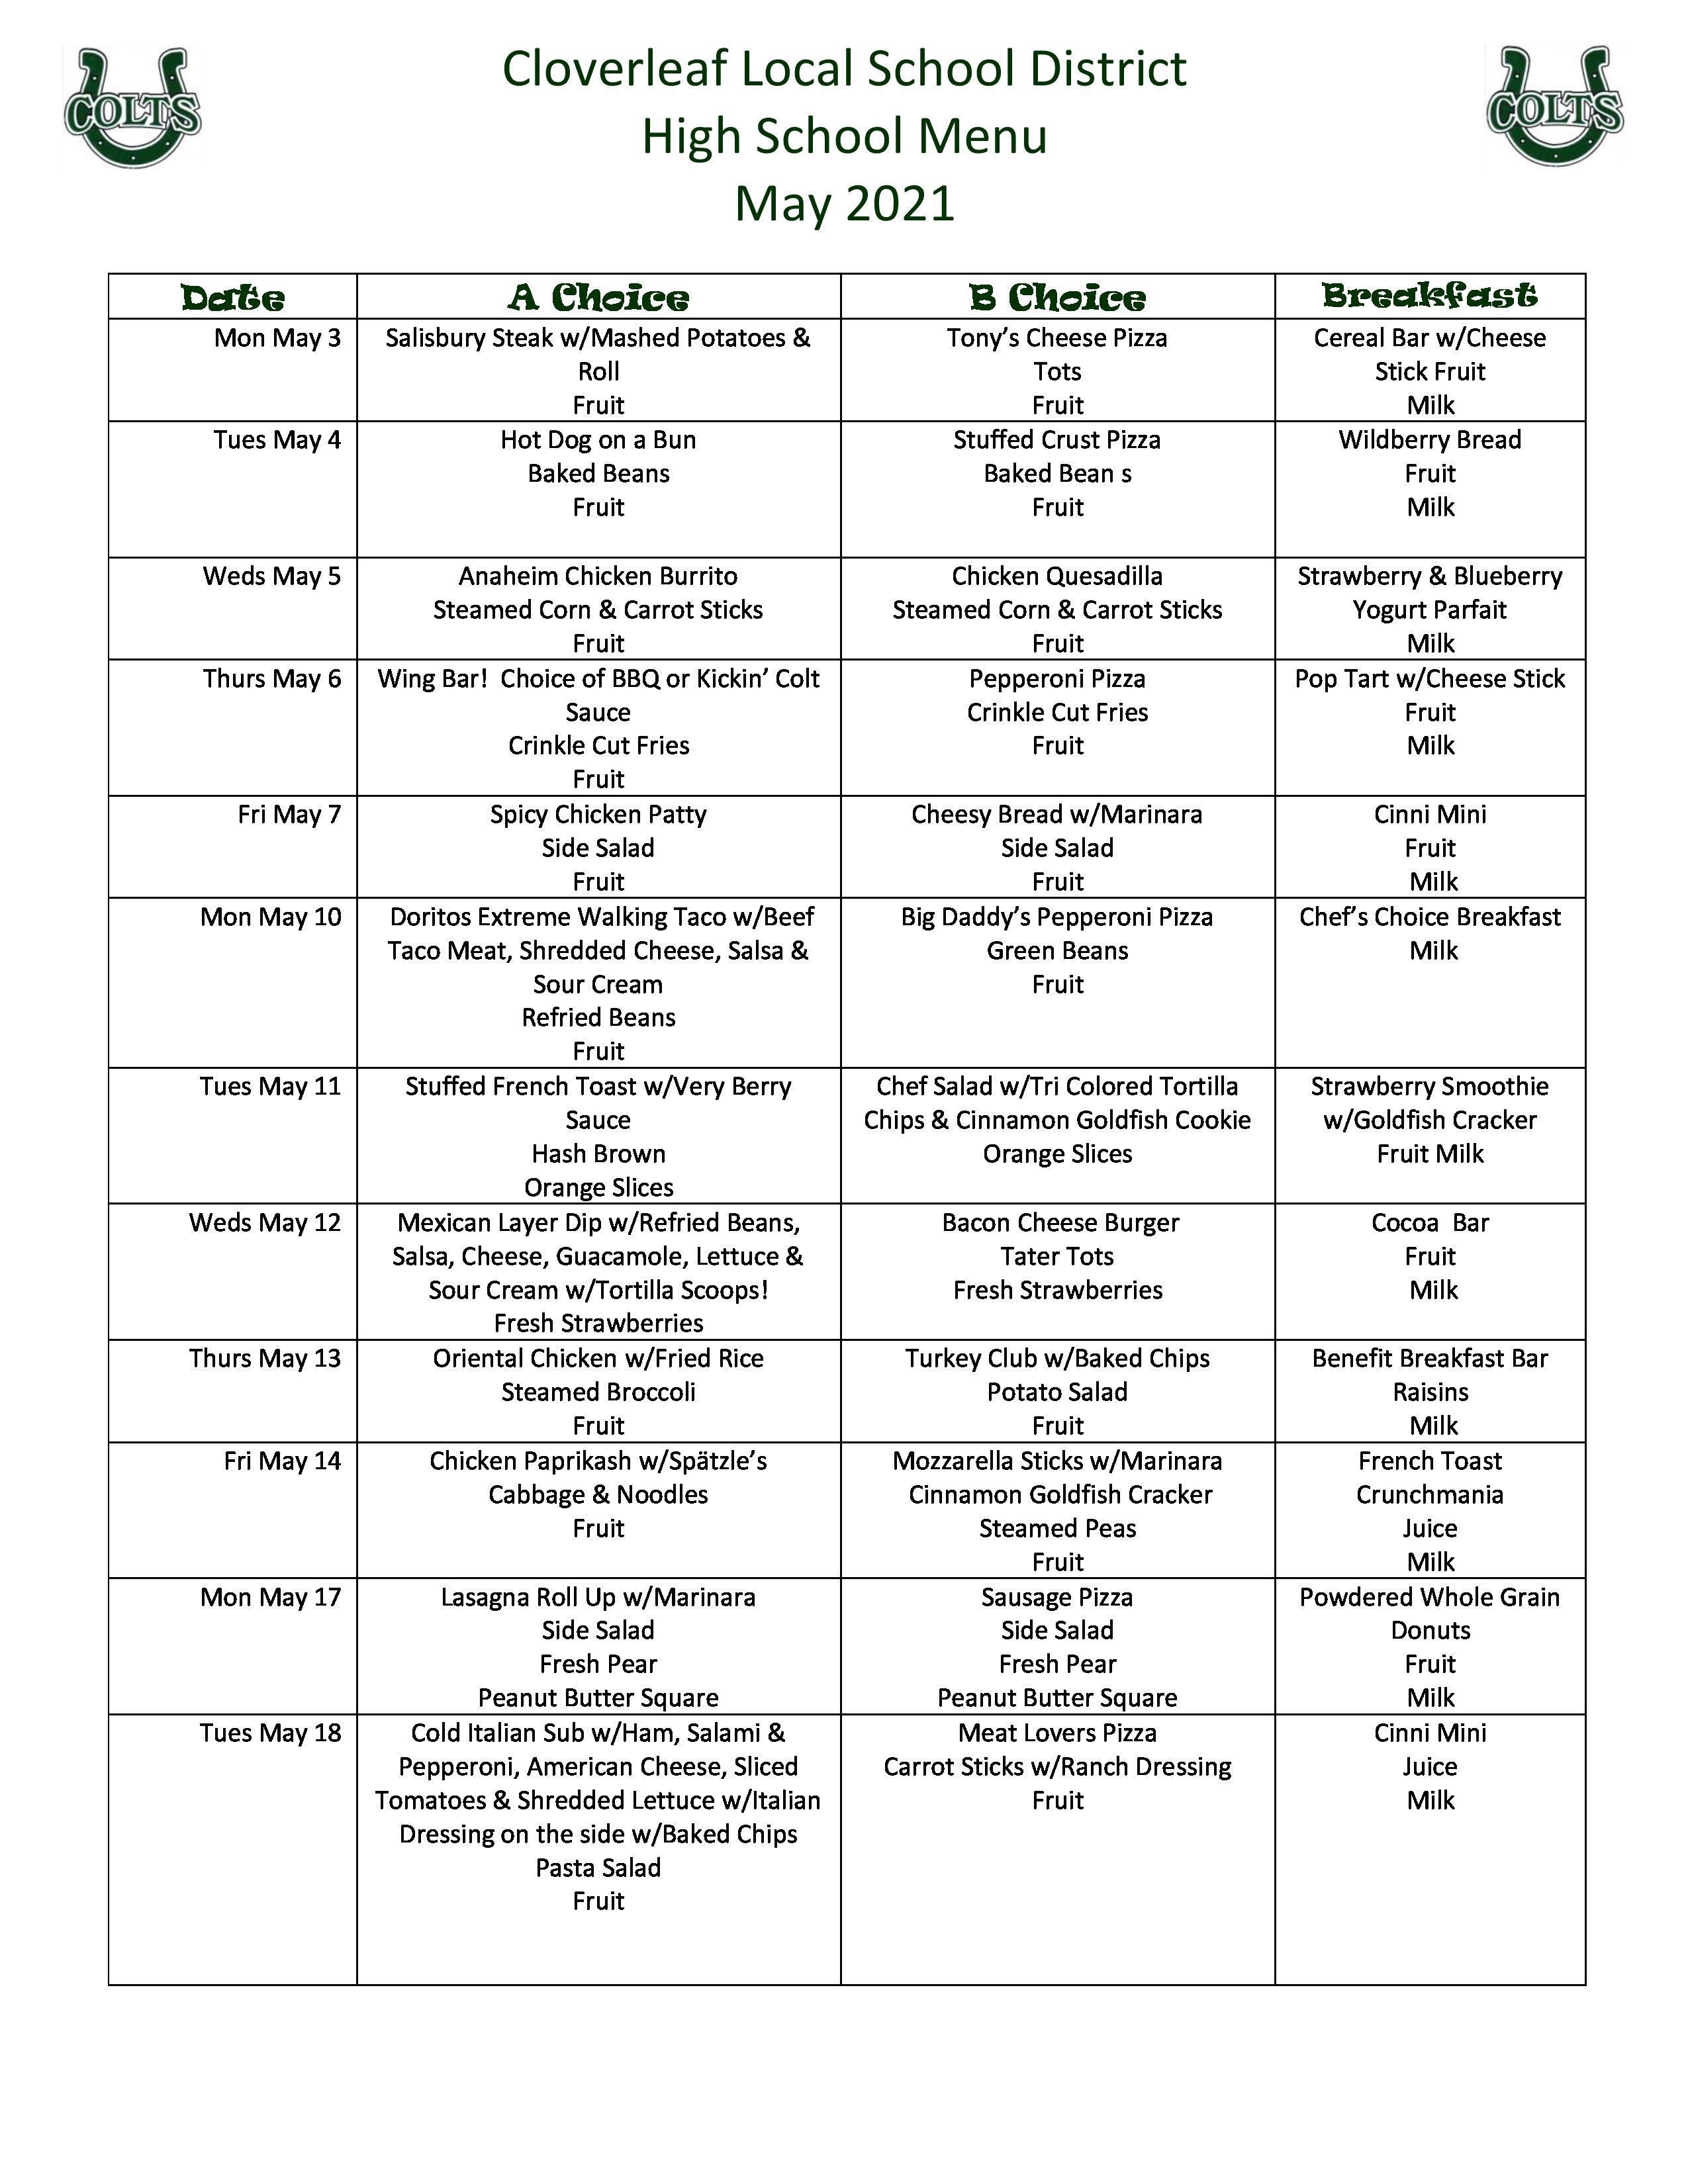 May high school menu